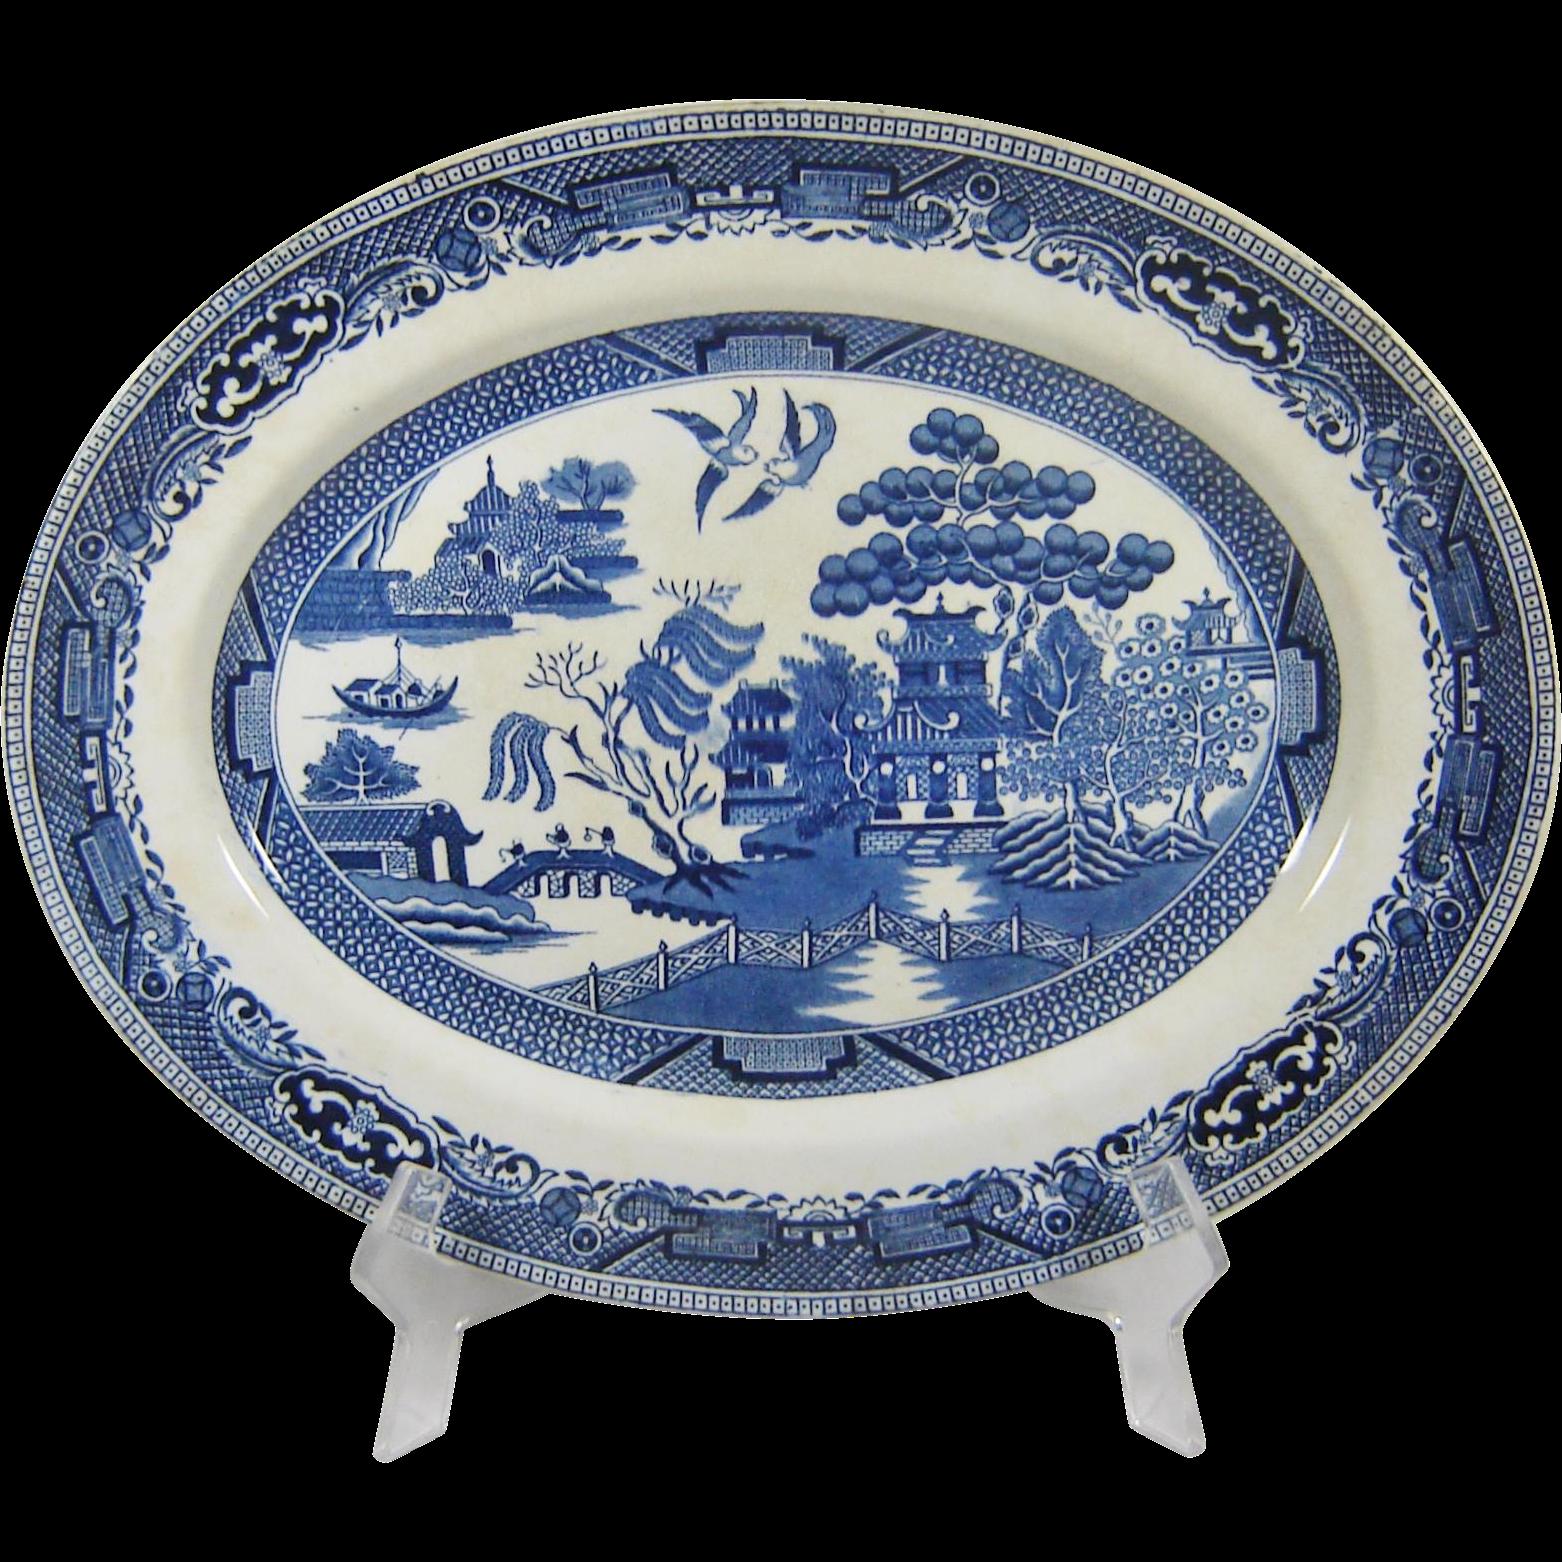 Swinnerton Blue Willow Platter Large England Transferware